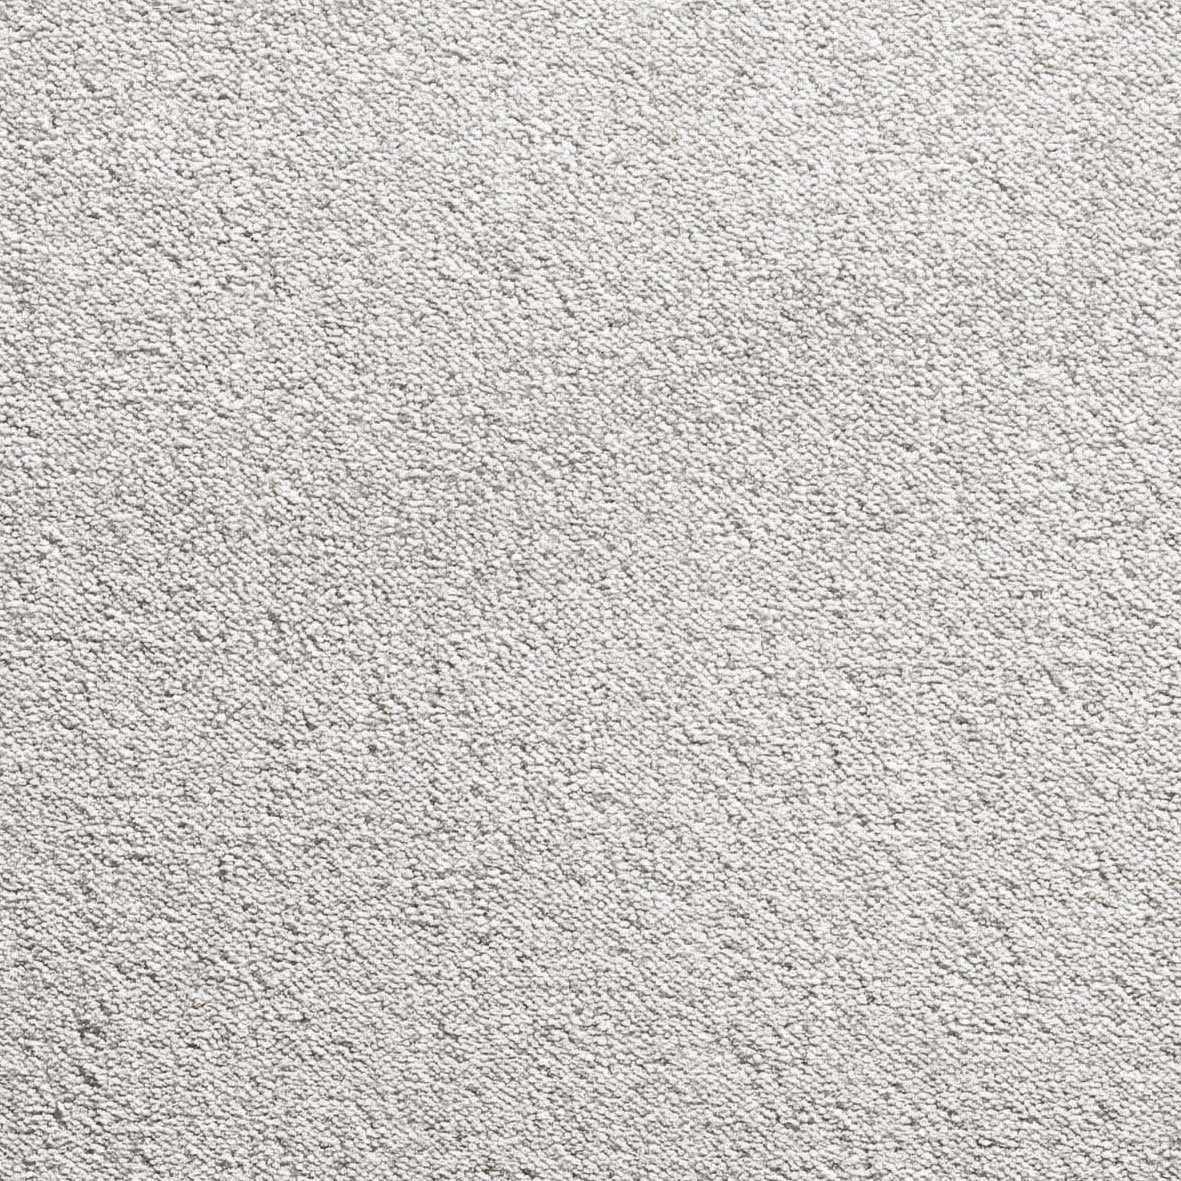 Moquette velours satino grise 4 m leroy merlin for Moquette grise texture